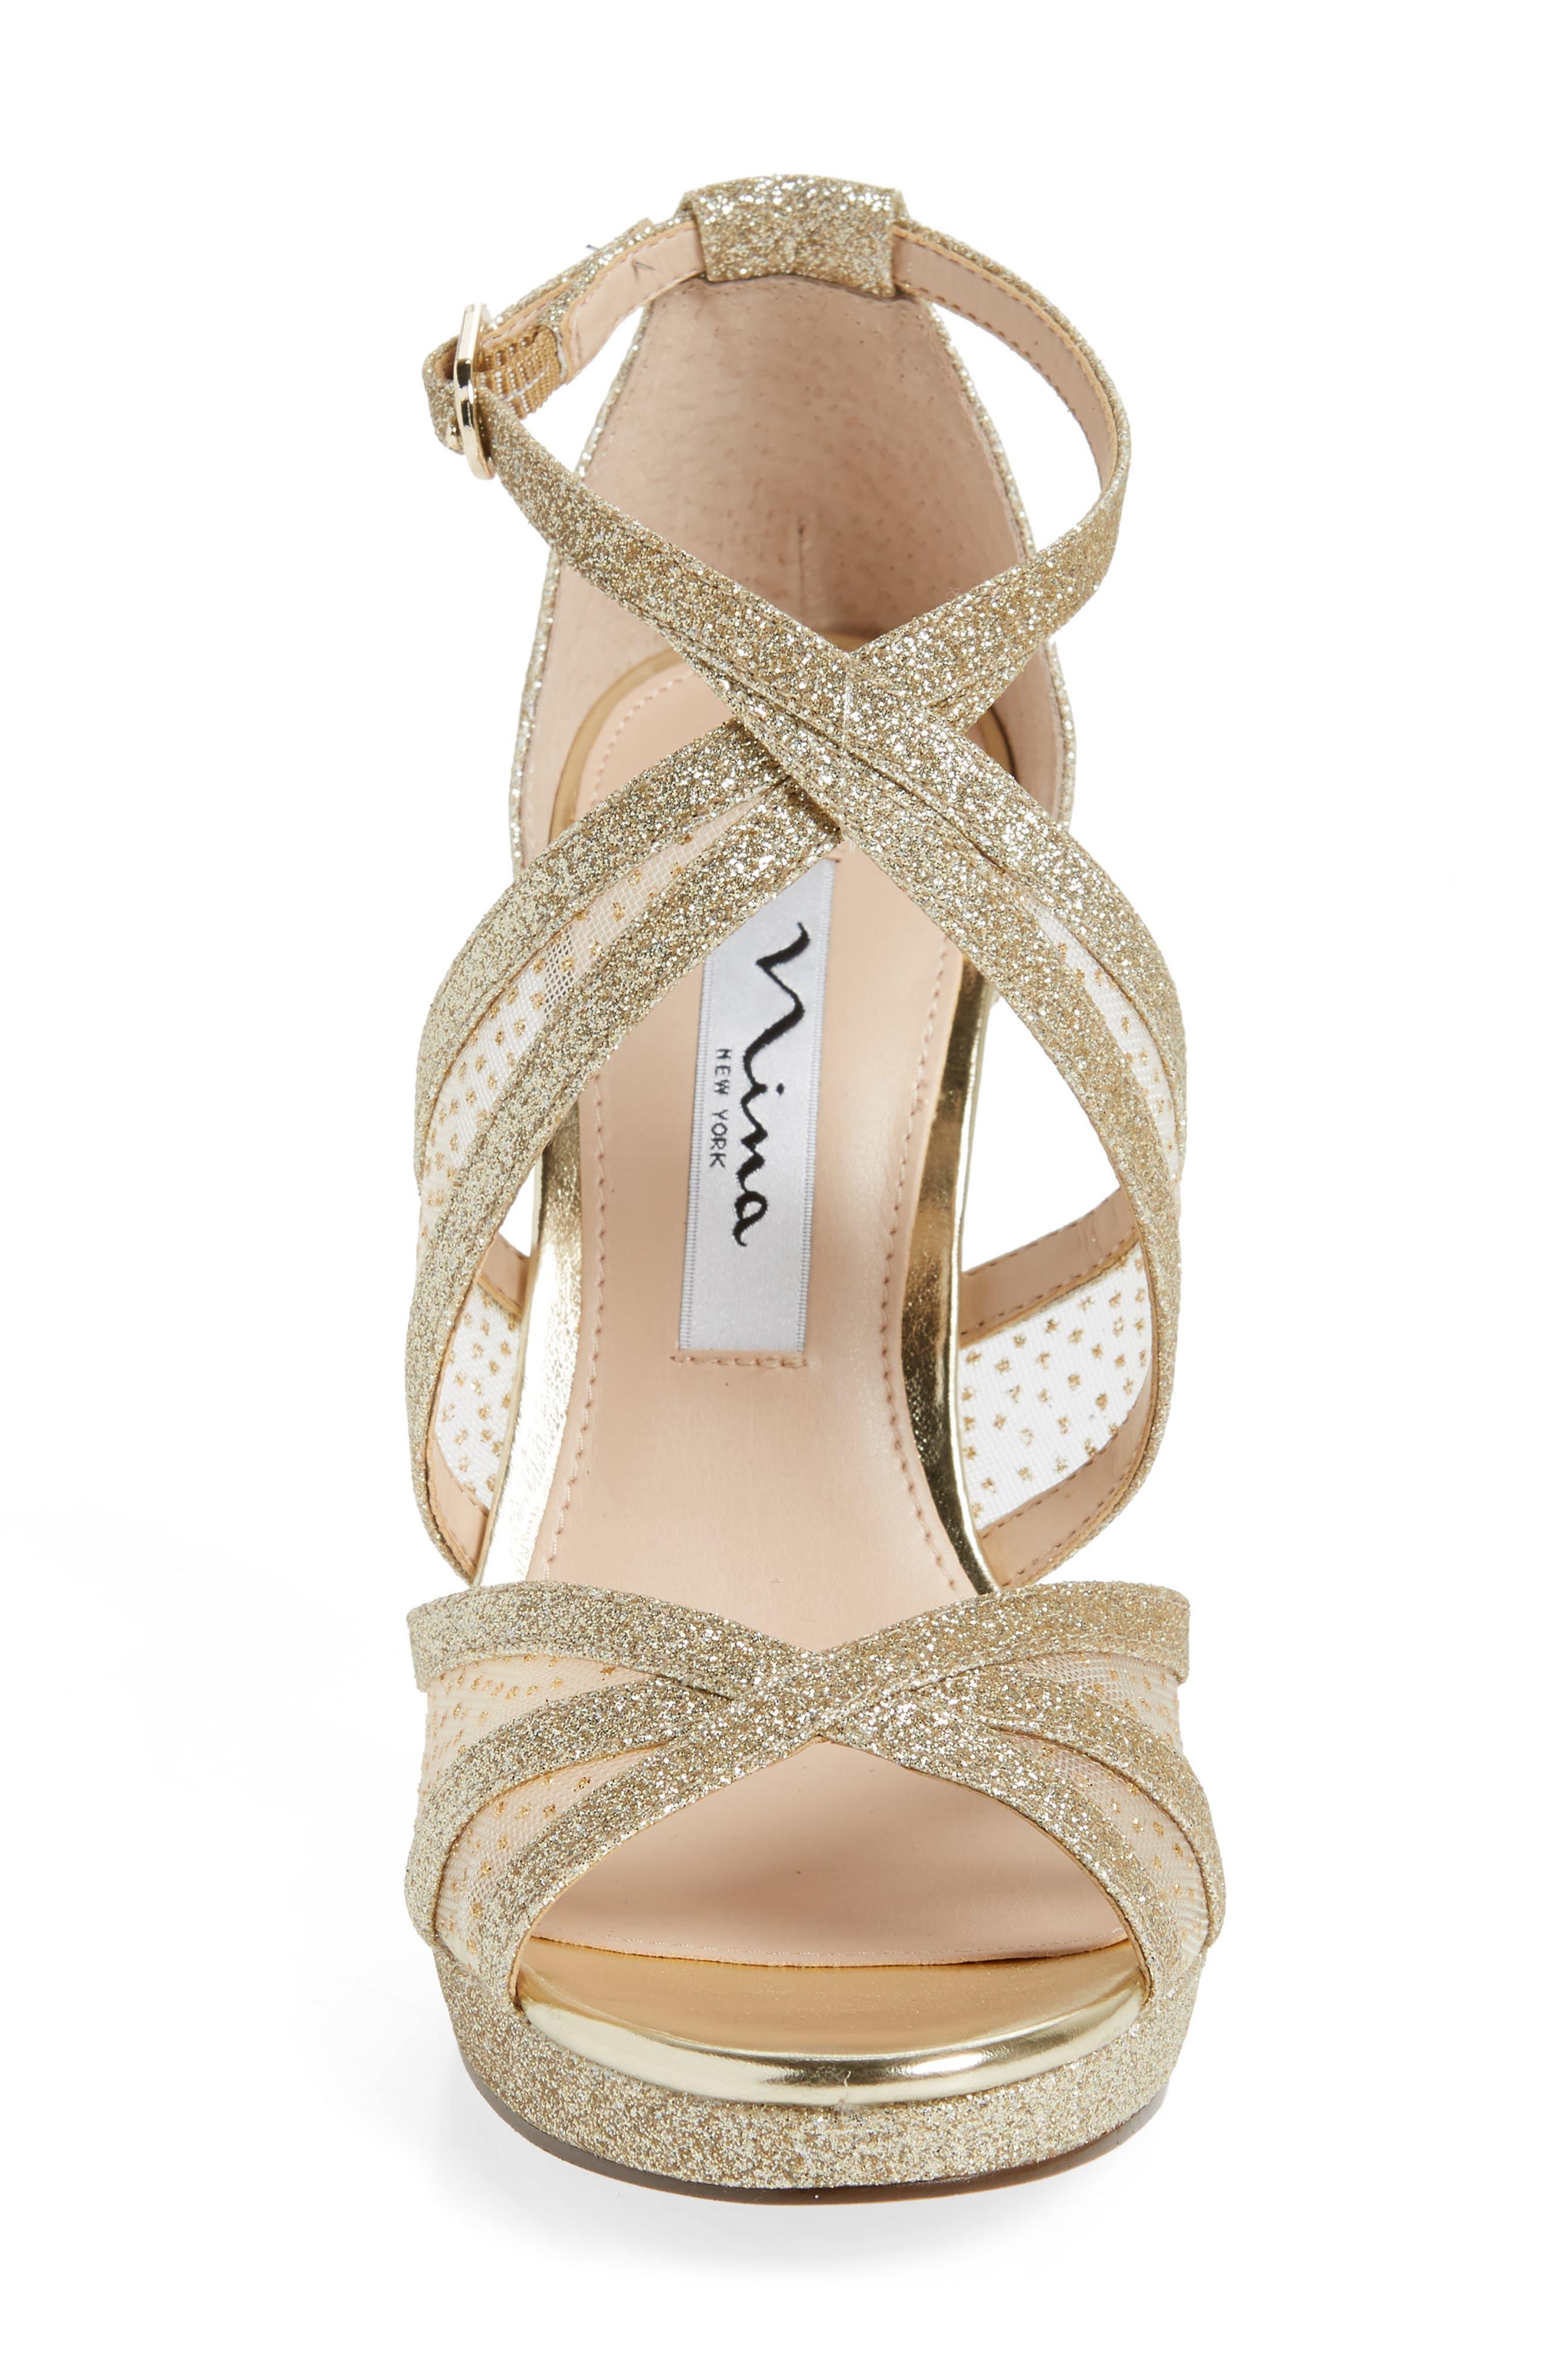 NINA, Fenna Strappy Platform Sandal, Alternate thumbnail 4, color, GOLD GLITTER FABRIC